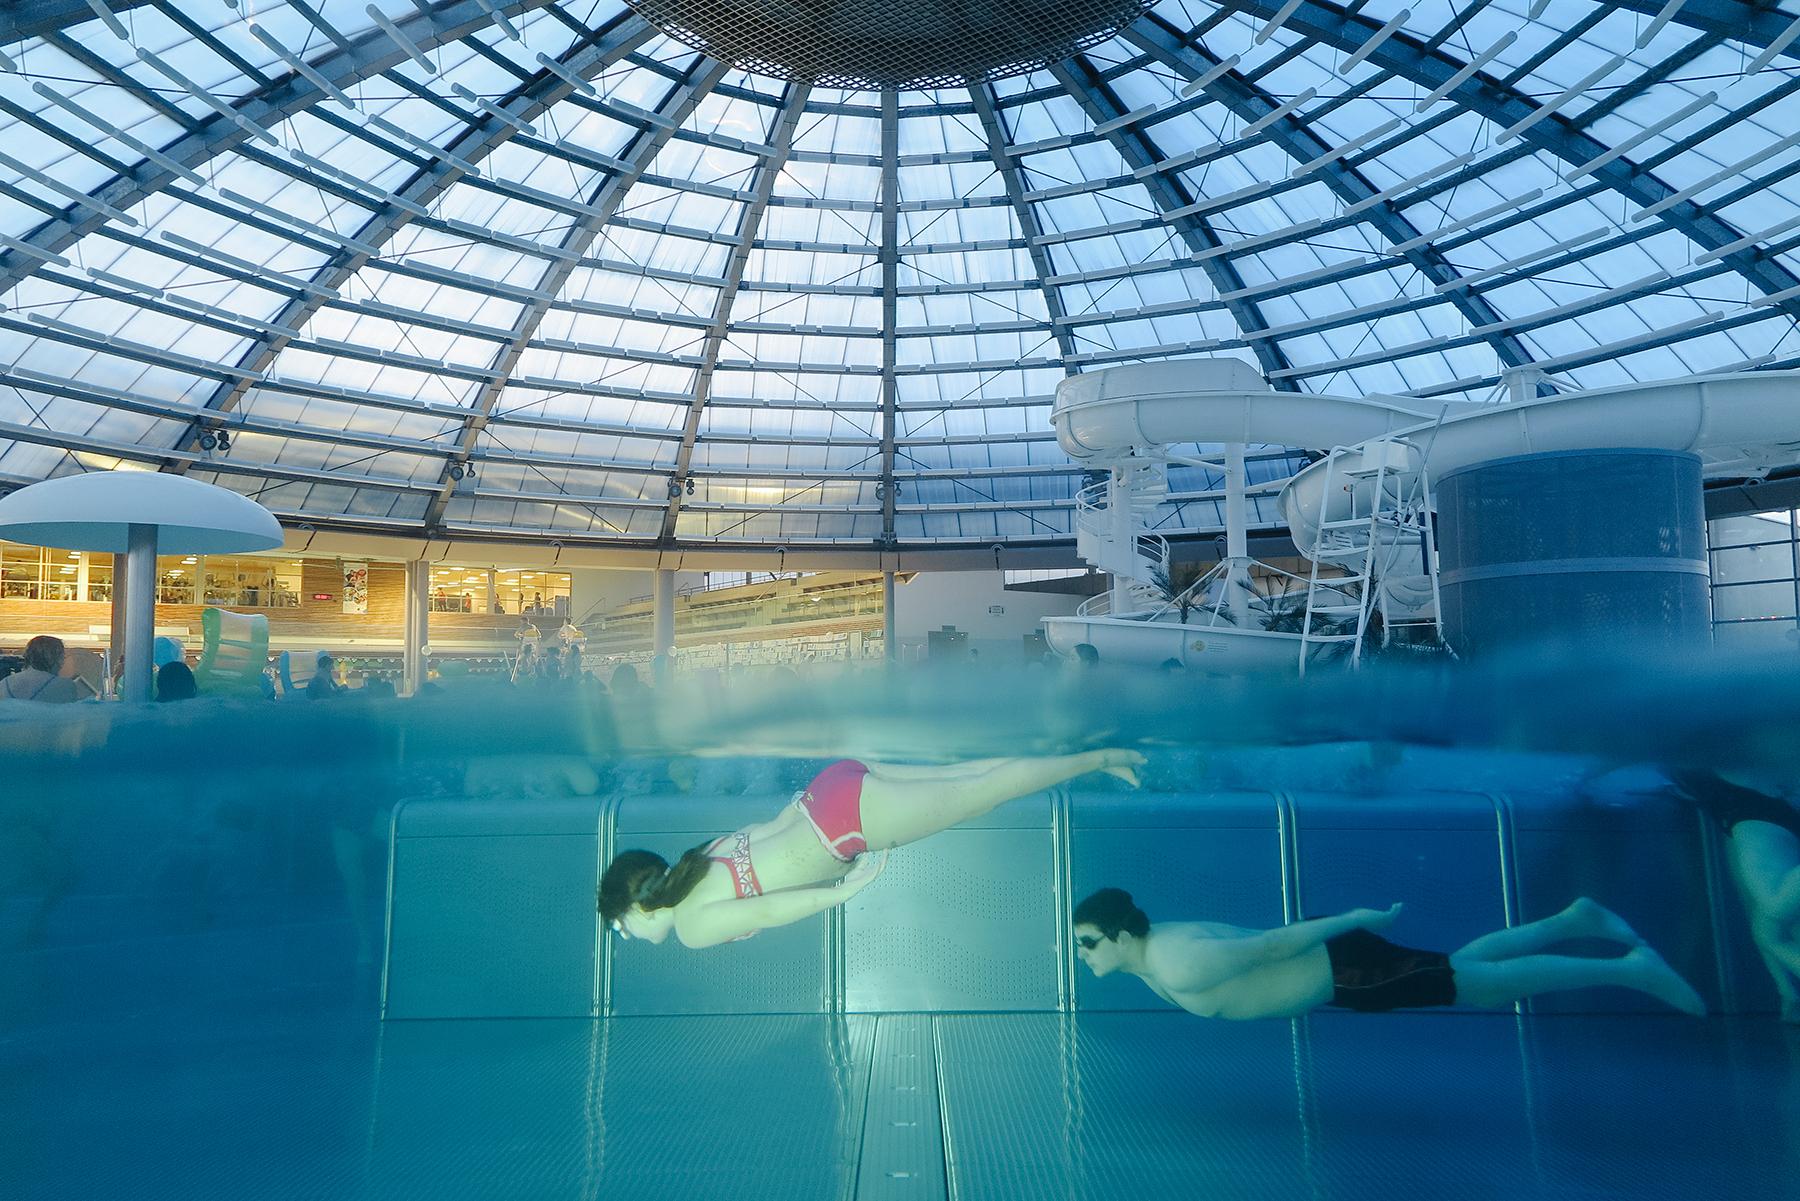 Stade Aquatique De Vichy Communauté avec Piscine Bellerive Horaire